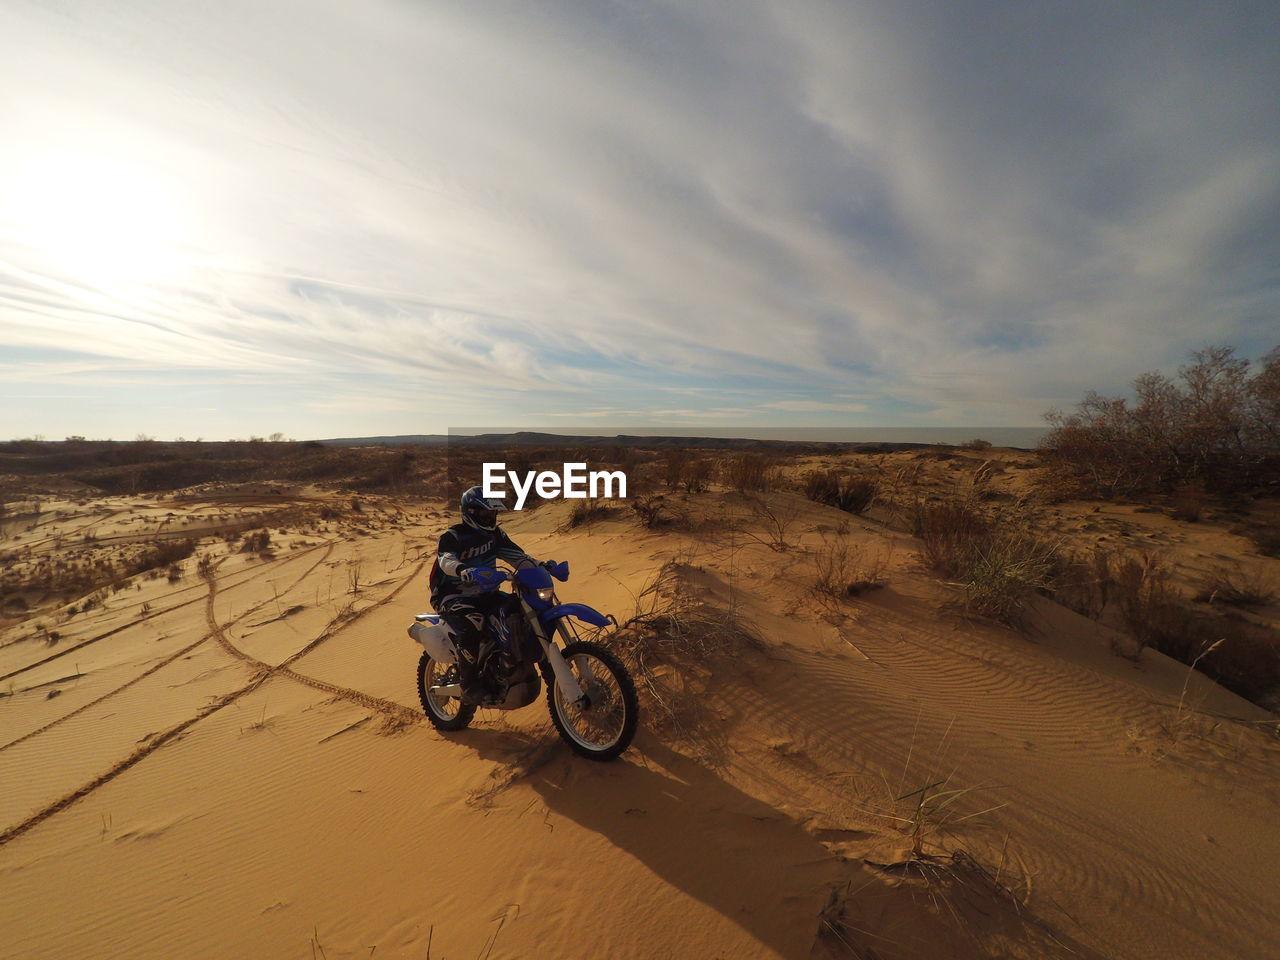 MAN RIDING BICYCLE ON SAND AT DESERT